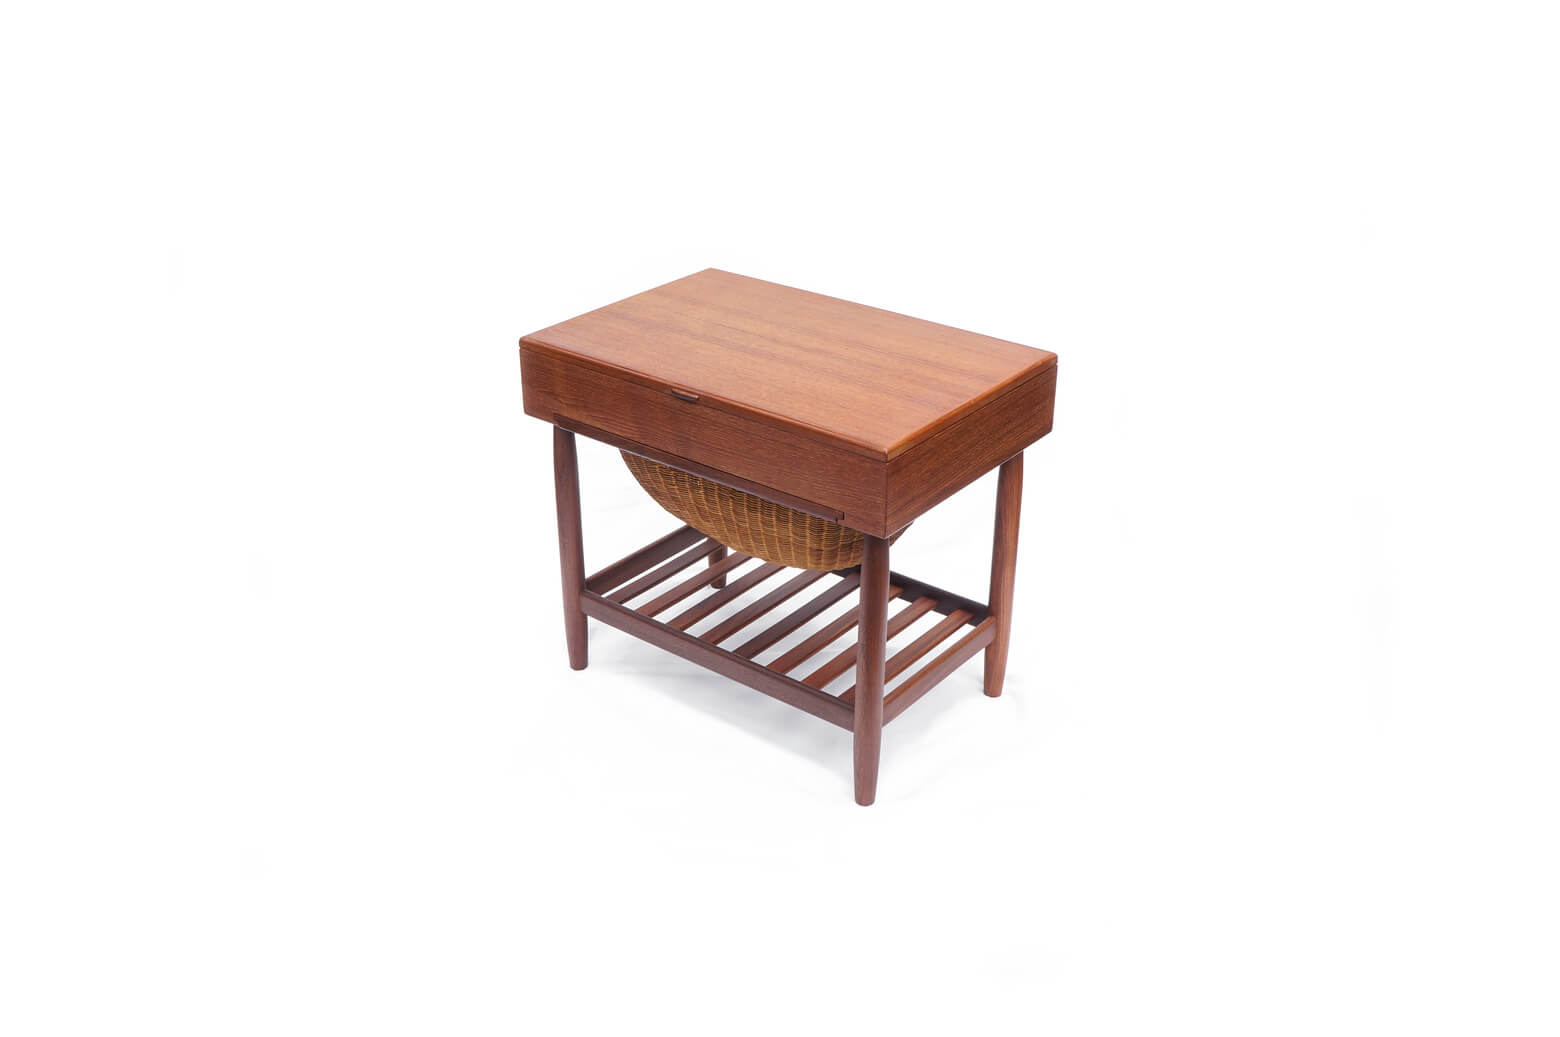 Danish Vintage Sewing Table Wagon Ejvind A. Johansson/デンマーク ヴィンテージ ソーイング テーブル ワゴン アイヴァン・A・ヨハンソン 北欧家具